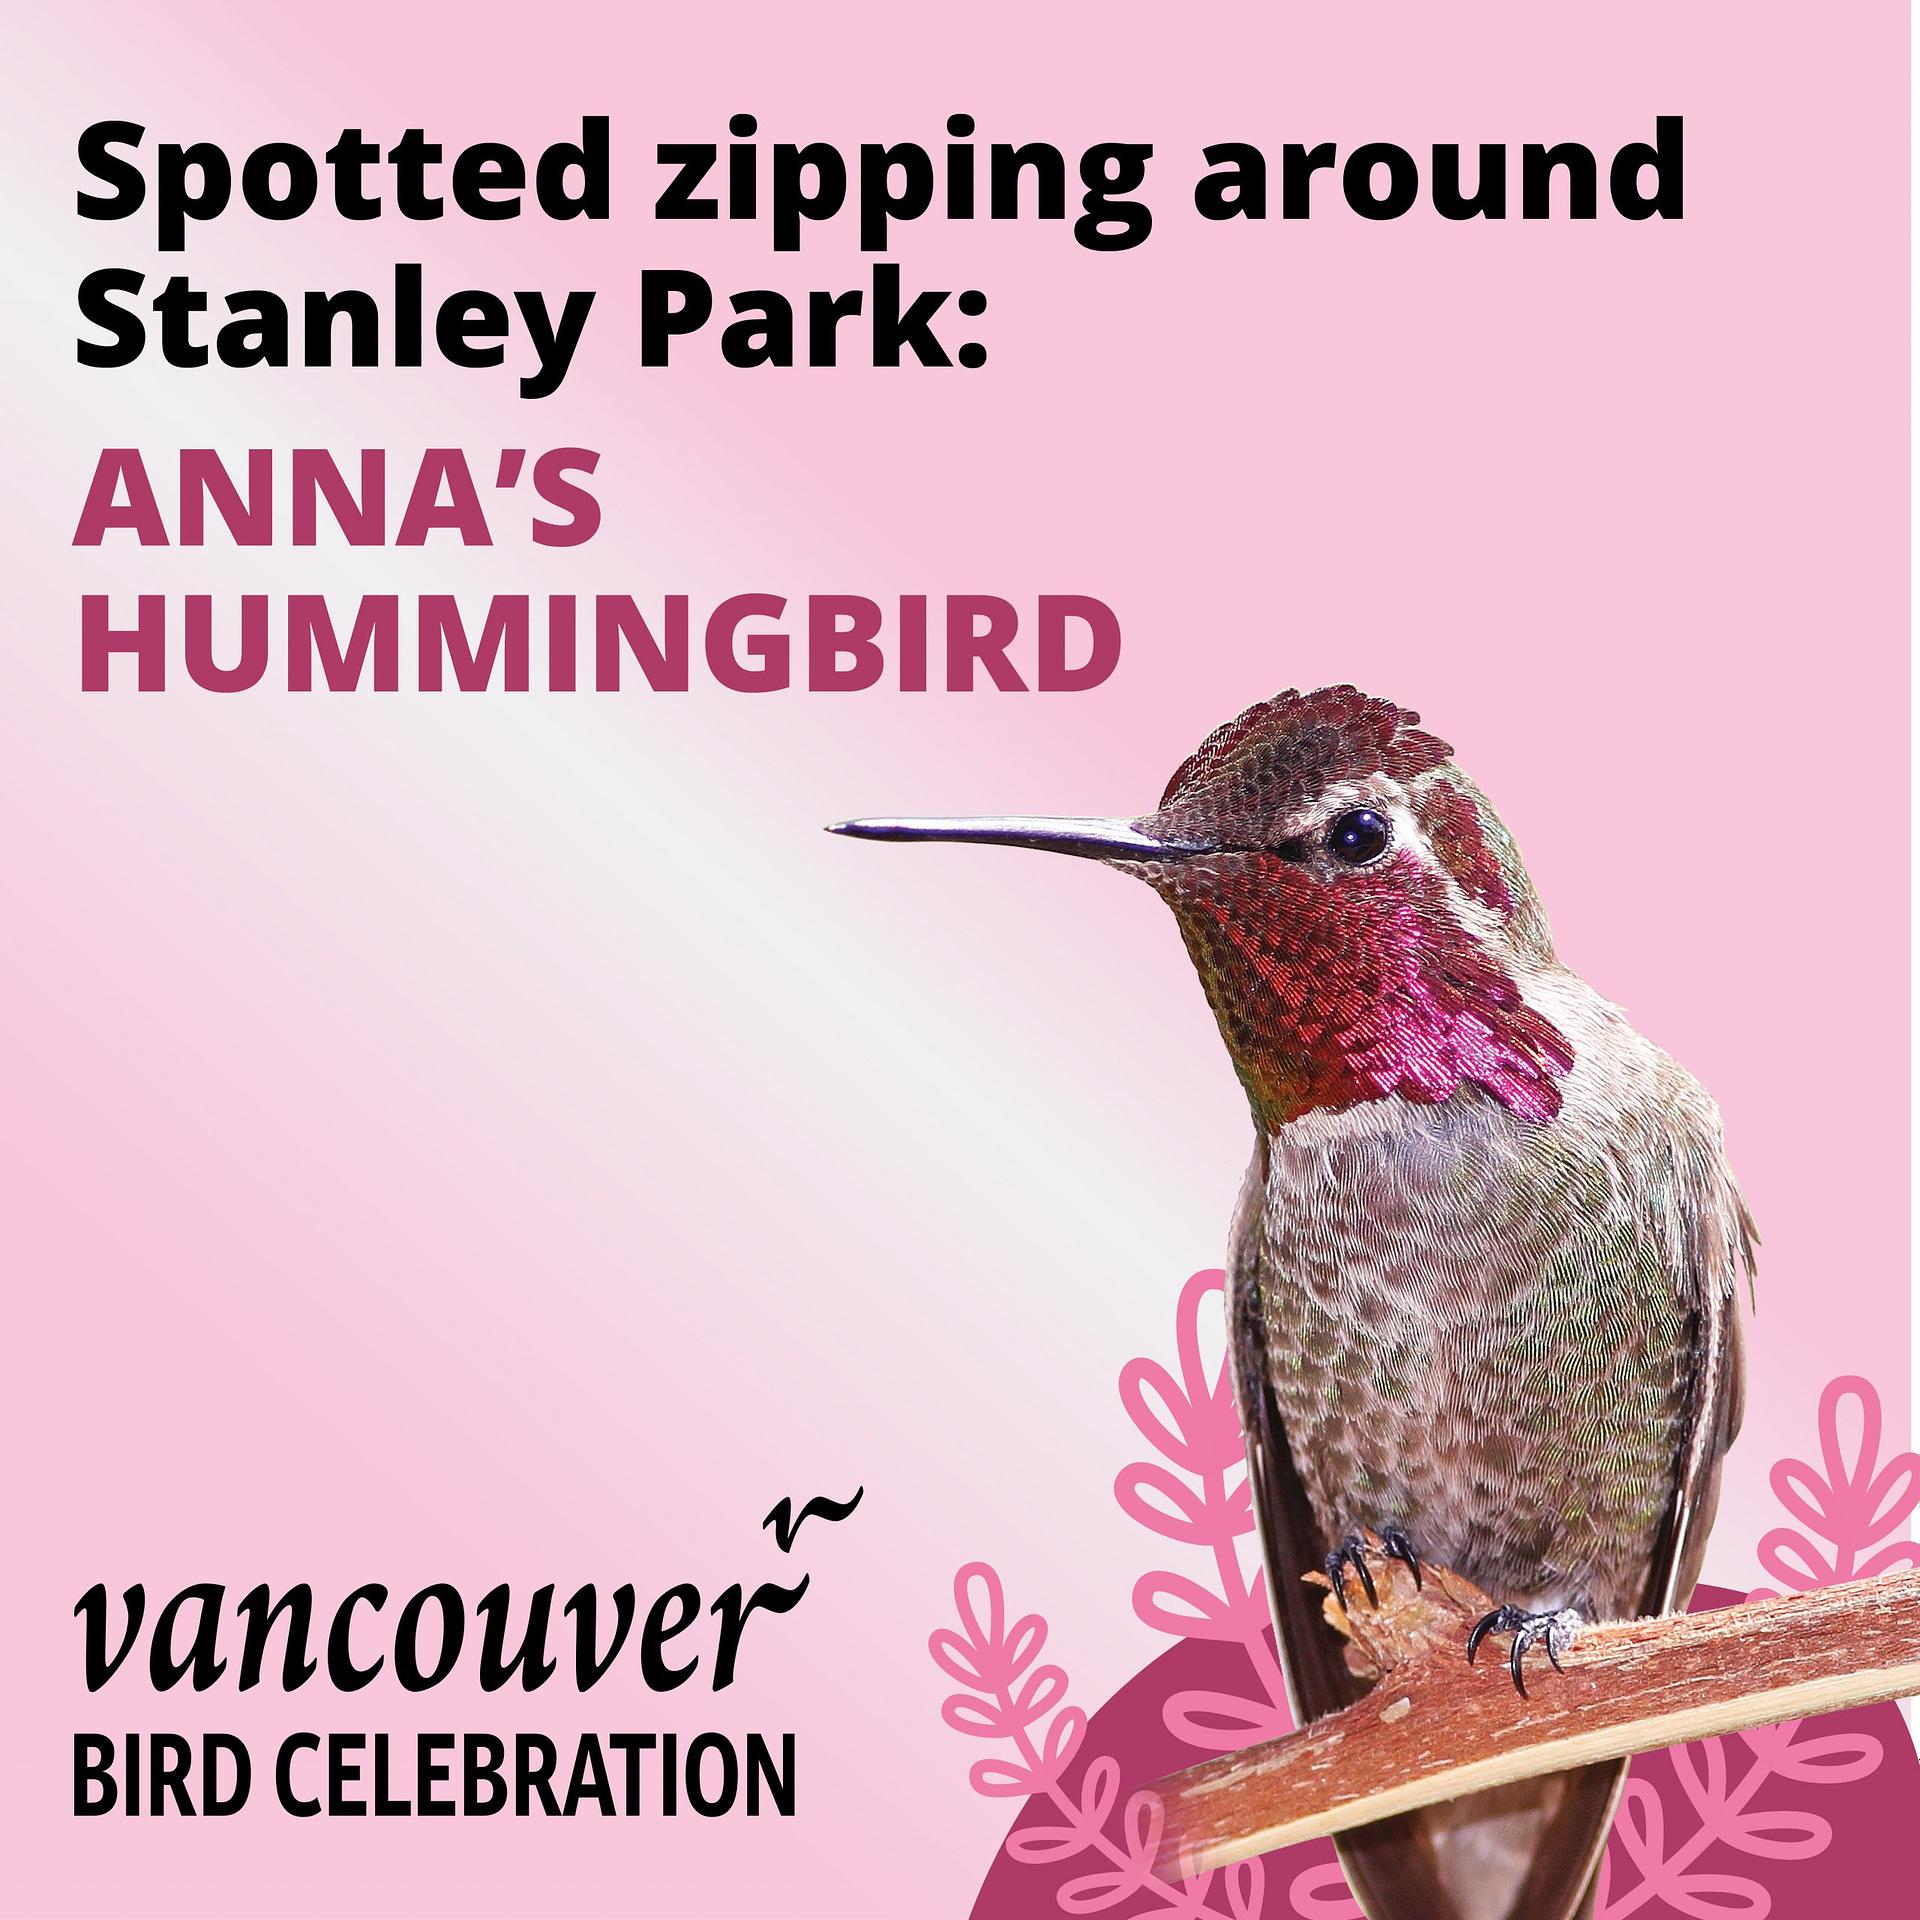 Anna's Hummingbird - Vancouver Bird Celebration